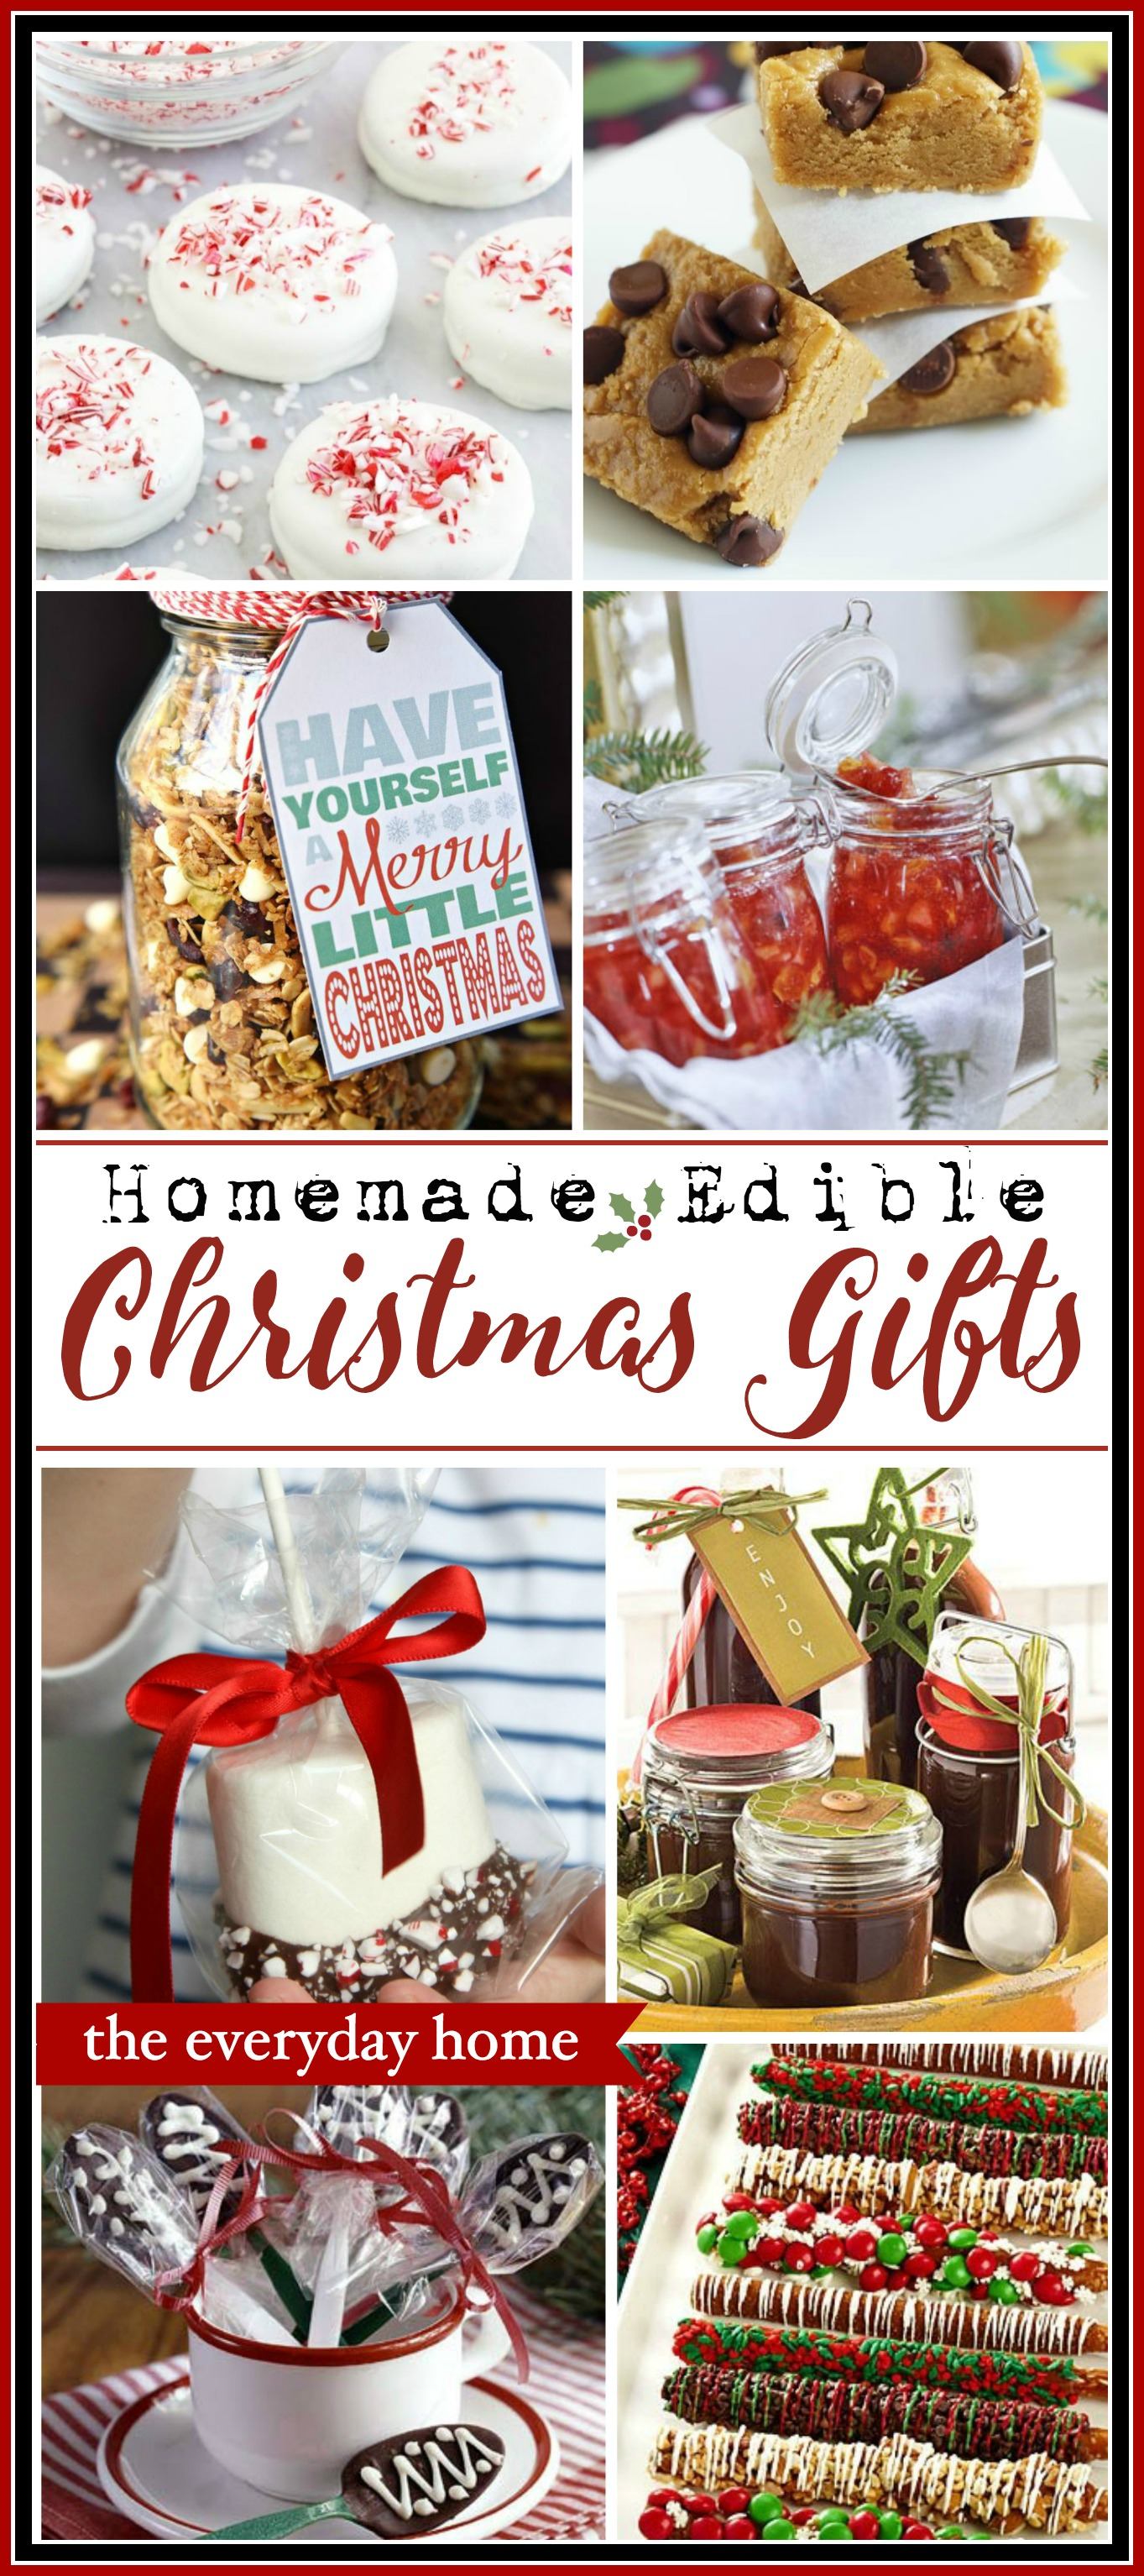 Homemade Edible Christmas Gifts   The Everyday Home   www.everydayhomeblog.com